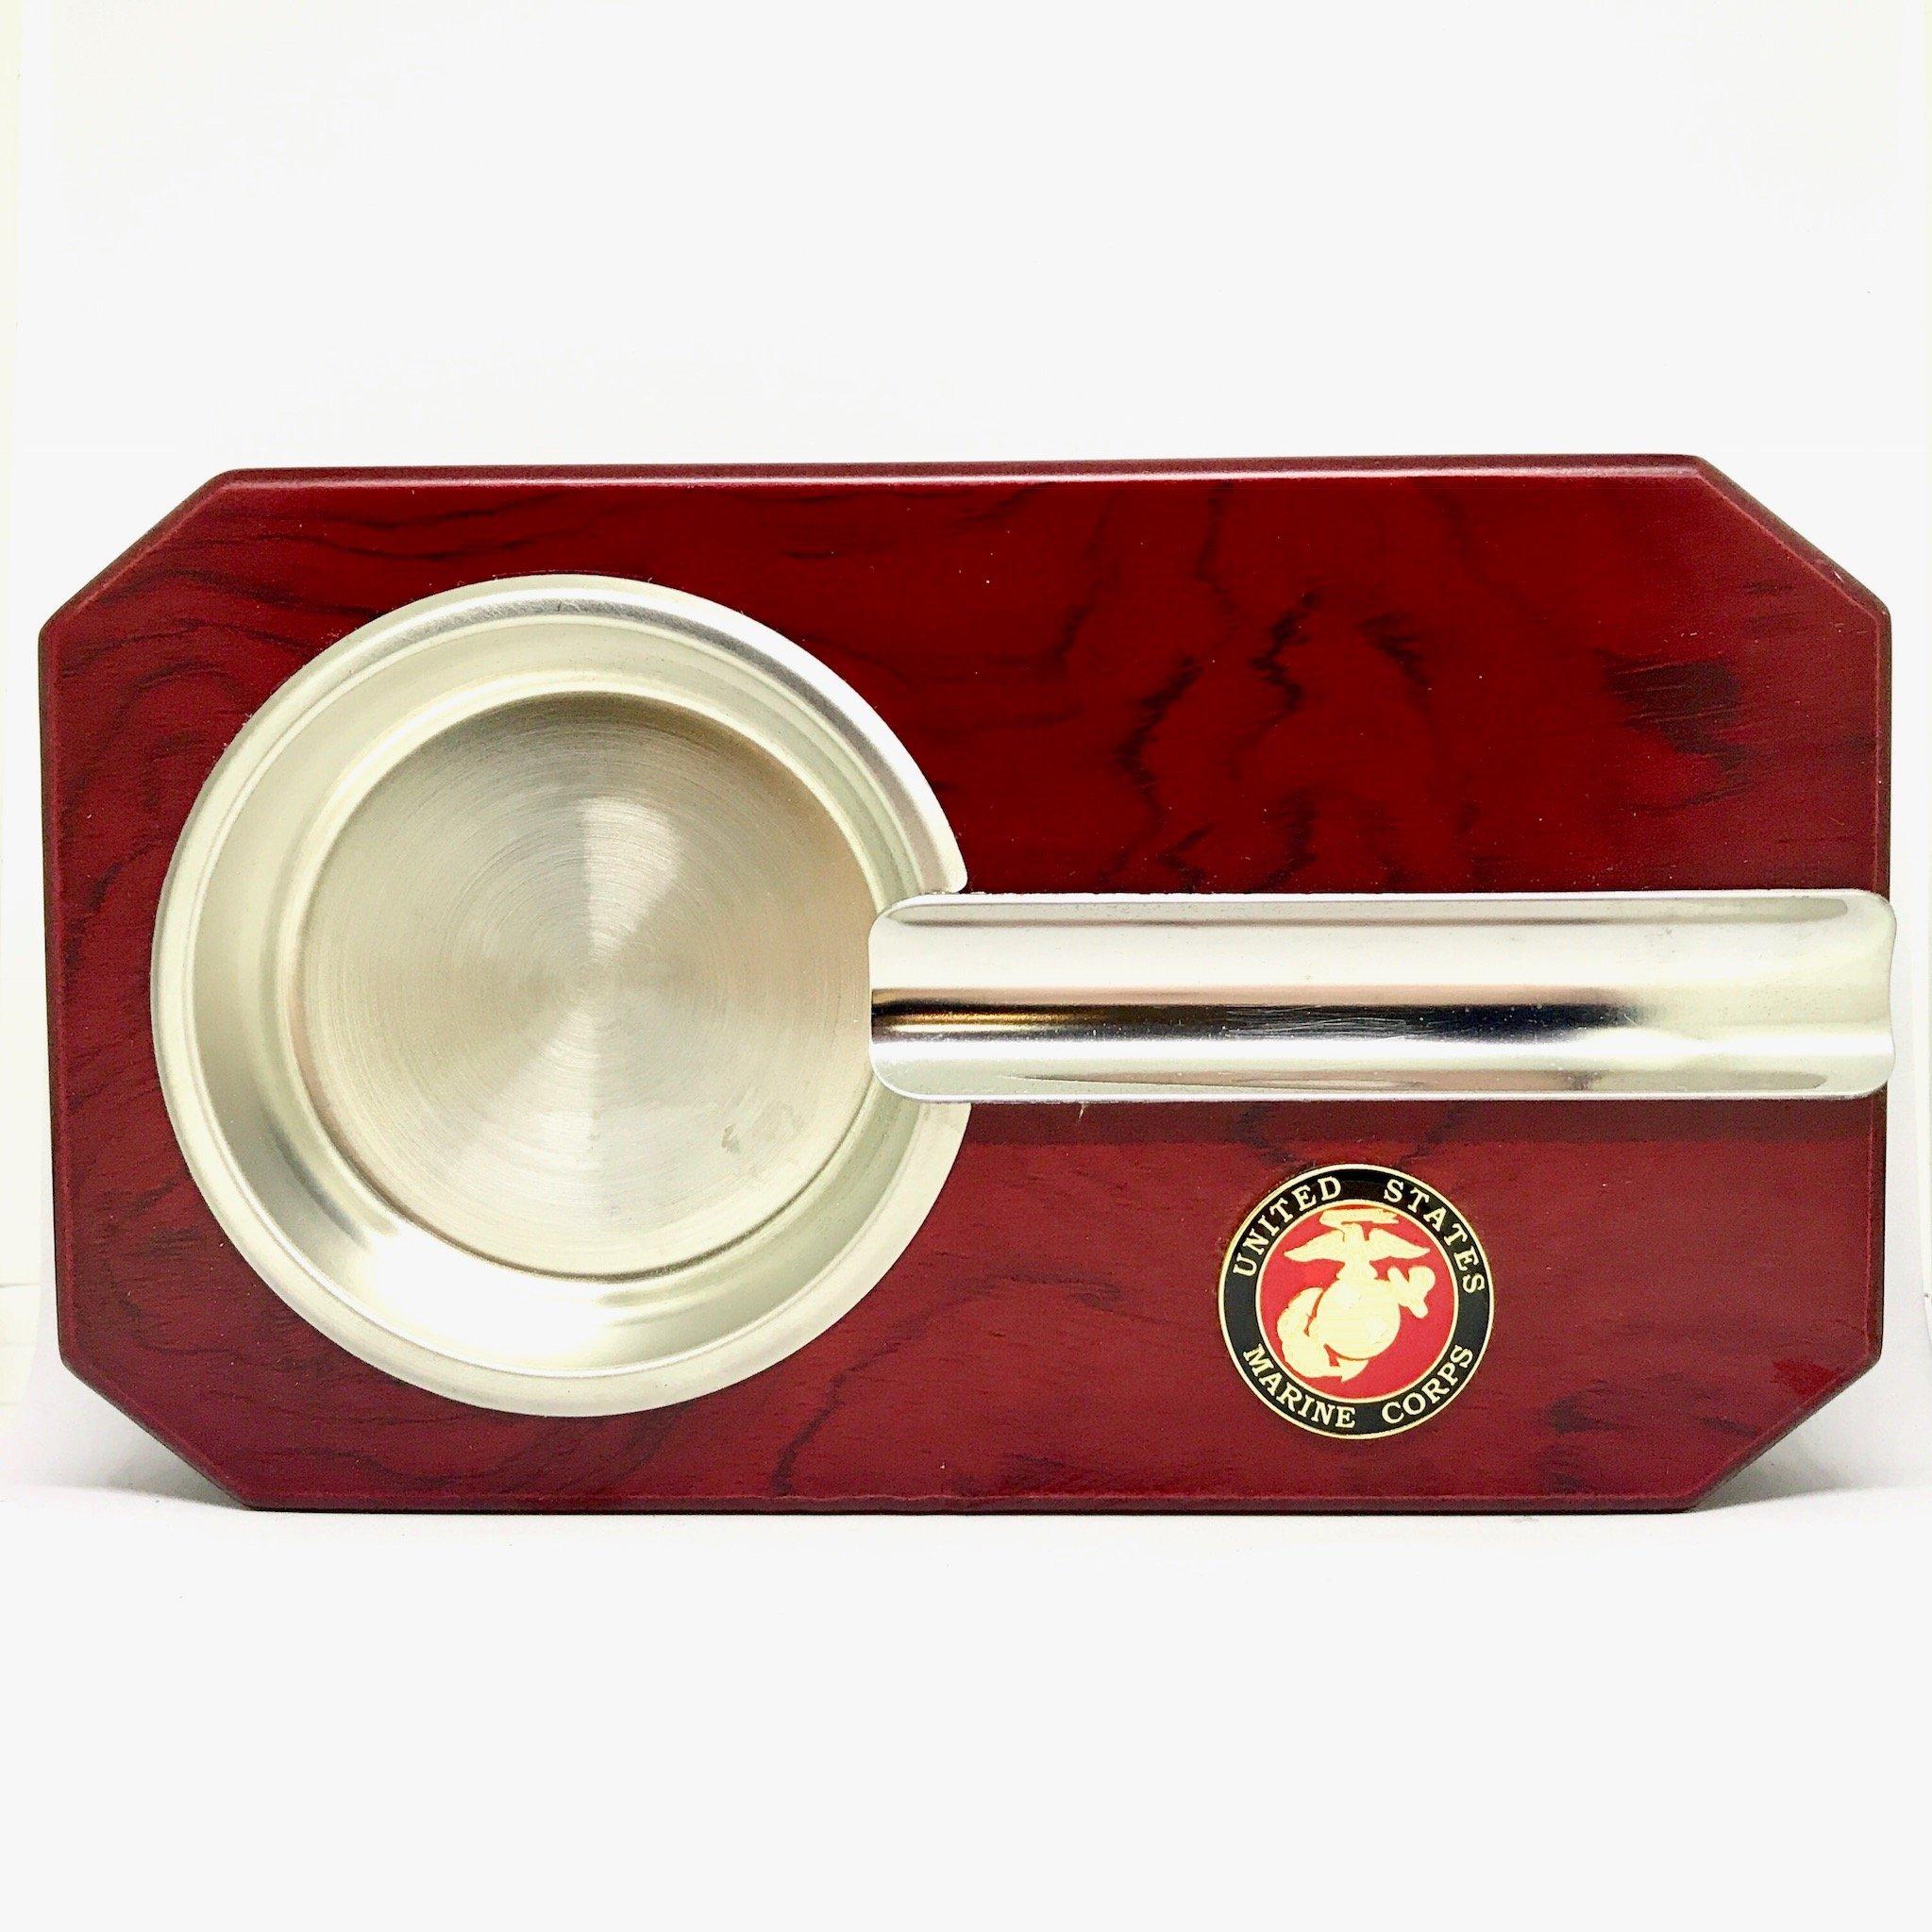 US Marines Cigar Ashtray - Military Cigar Accessories